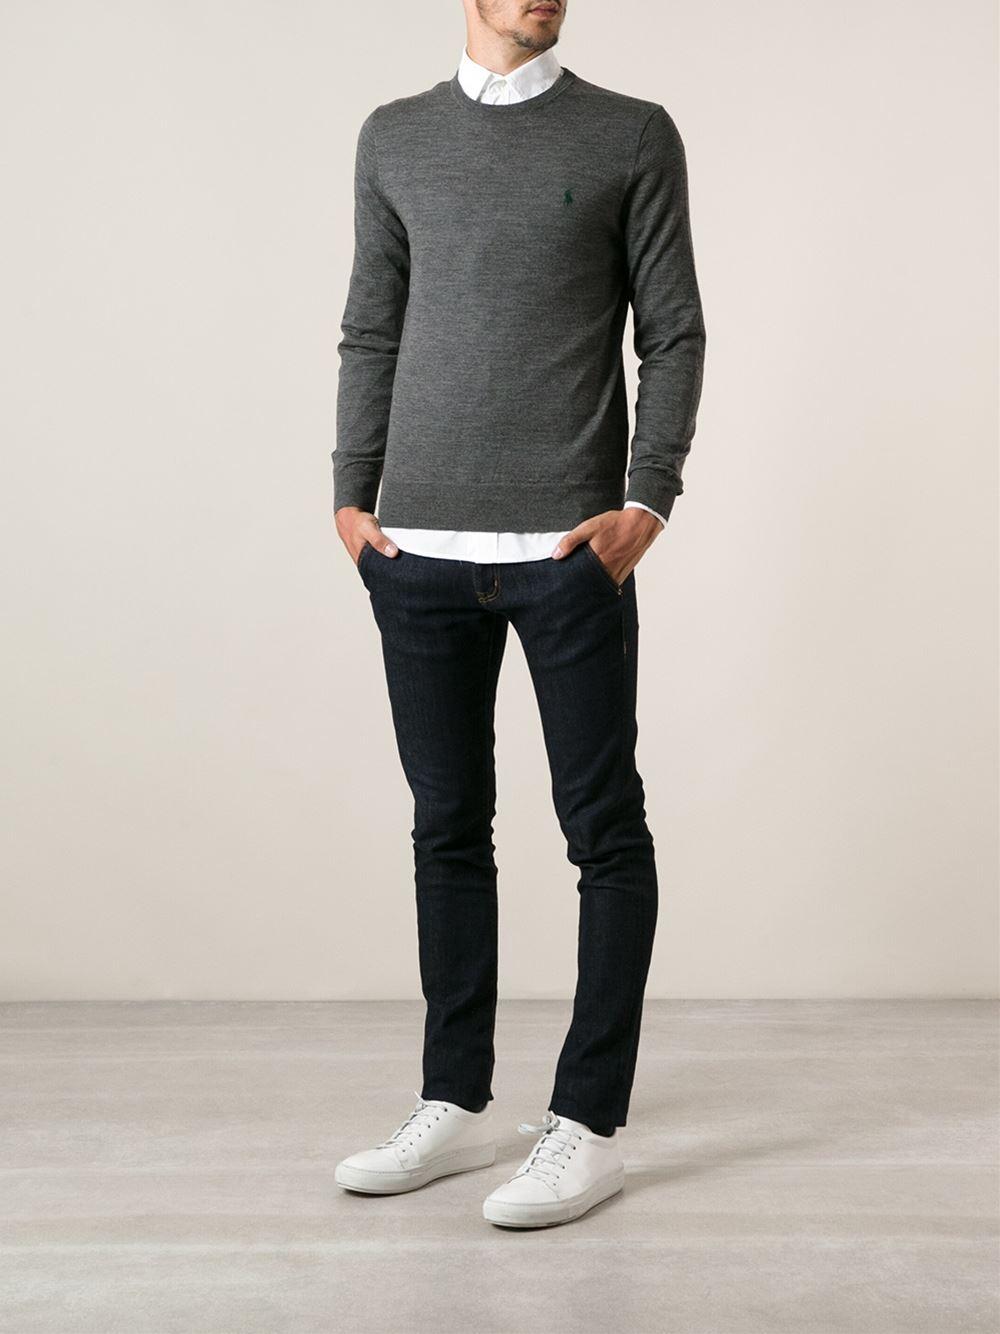 polo ralph lauren slim fit crew neck sweater in gray for men grey. Black Bedroom Furniture Sets. Home Design Ideas